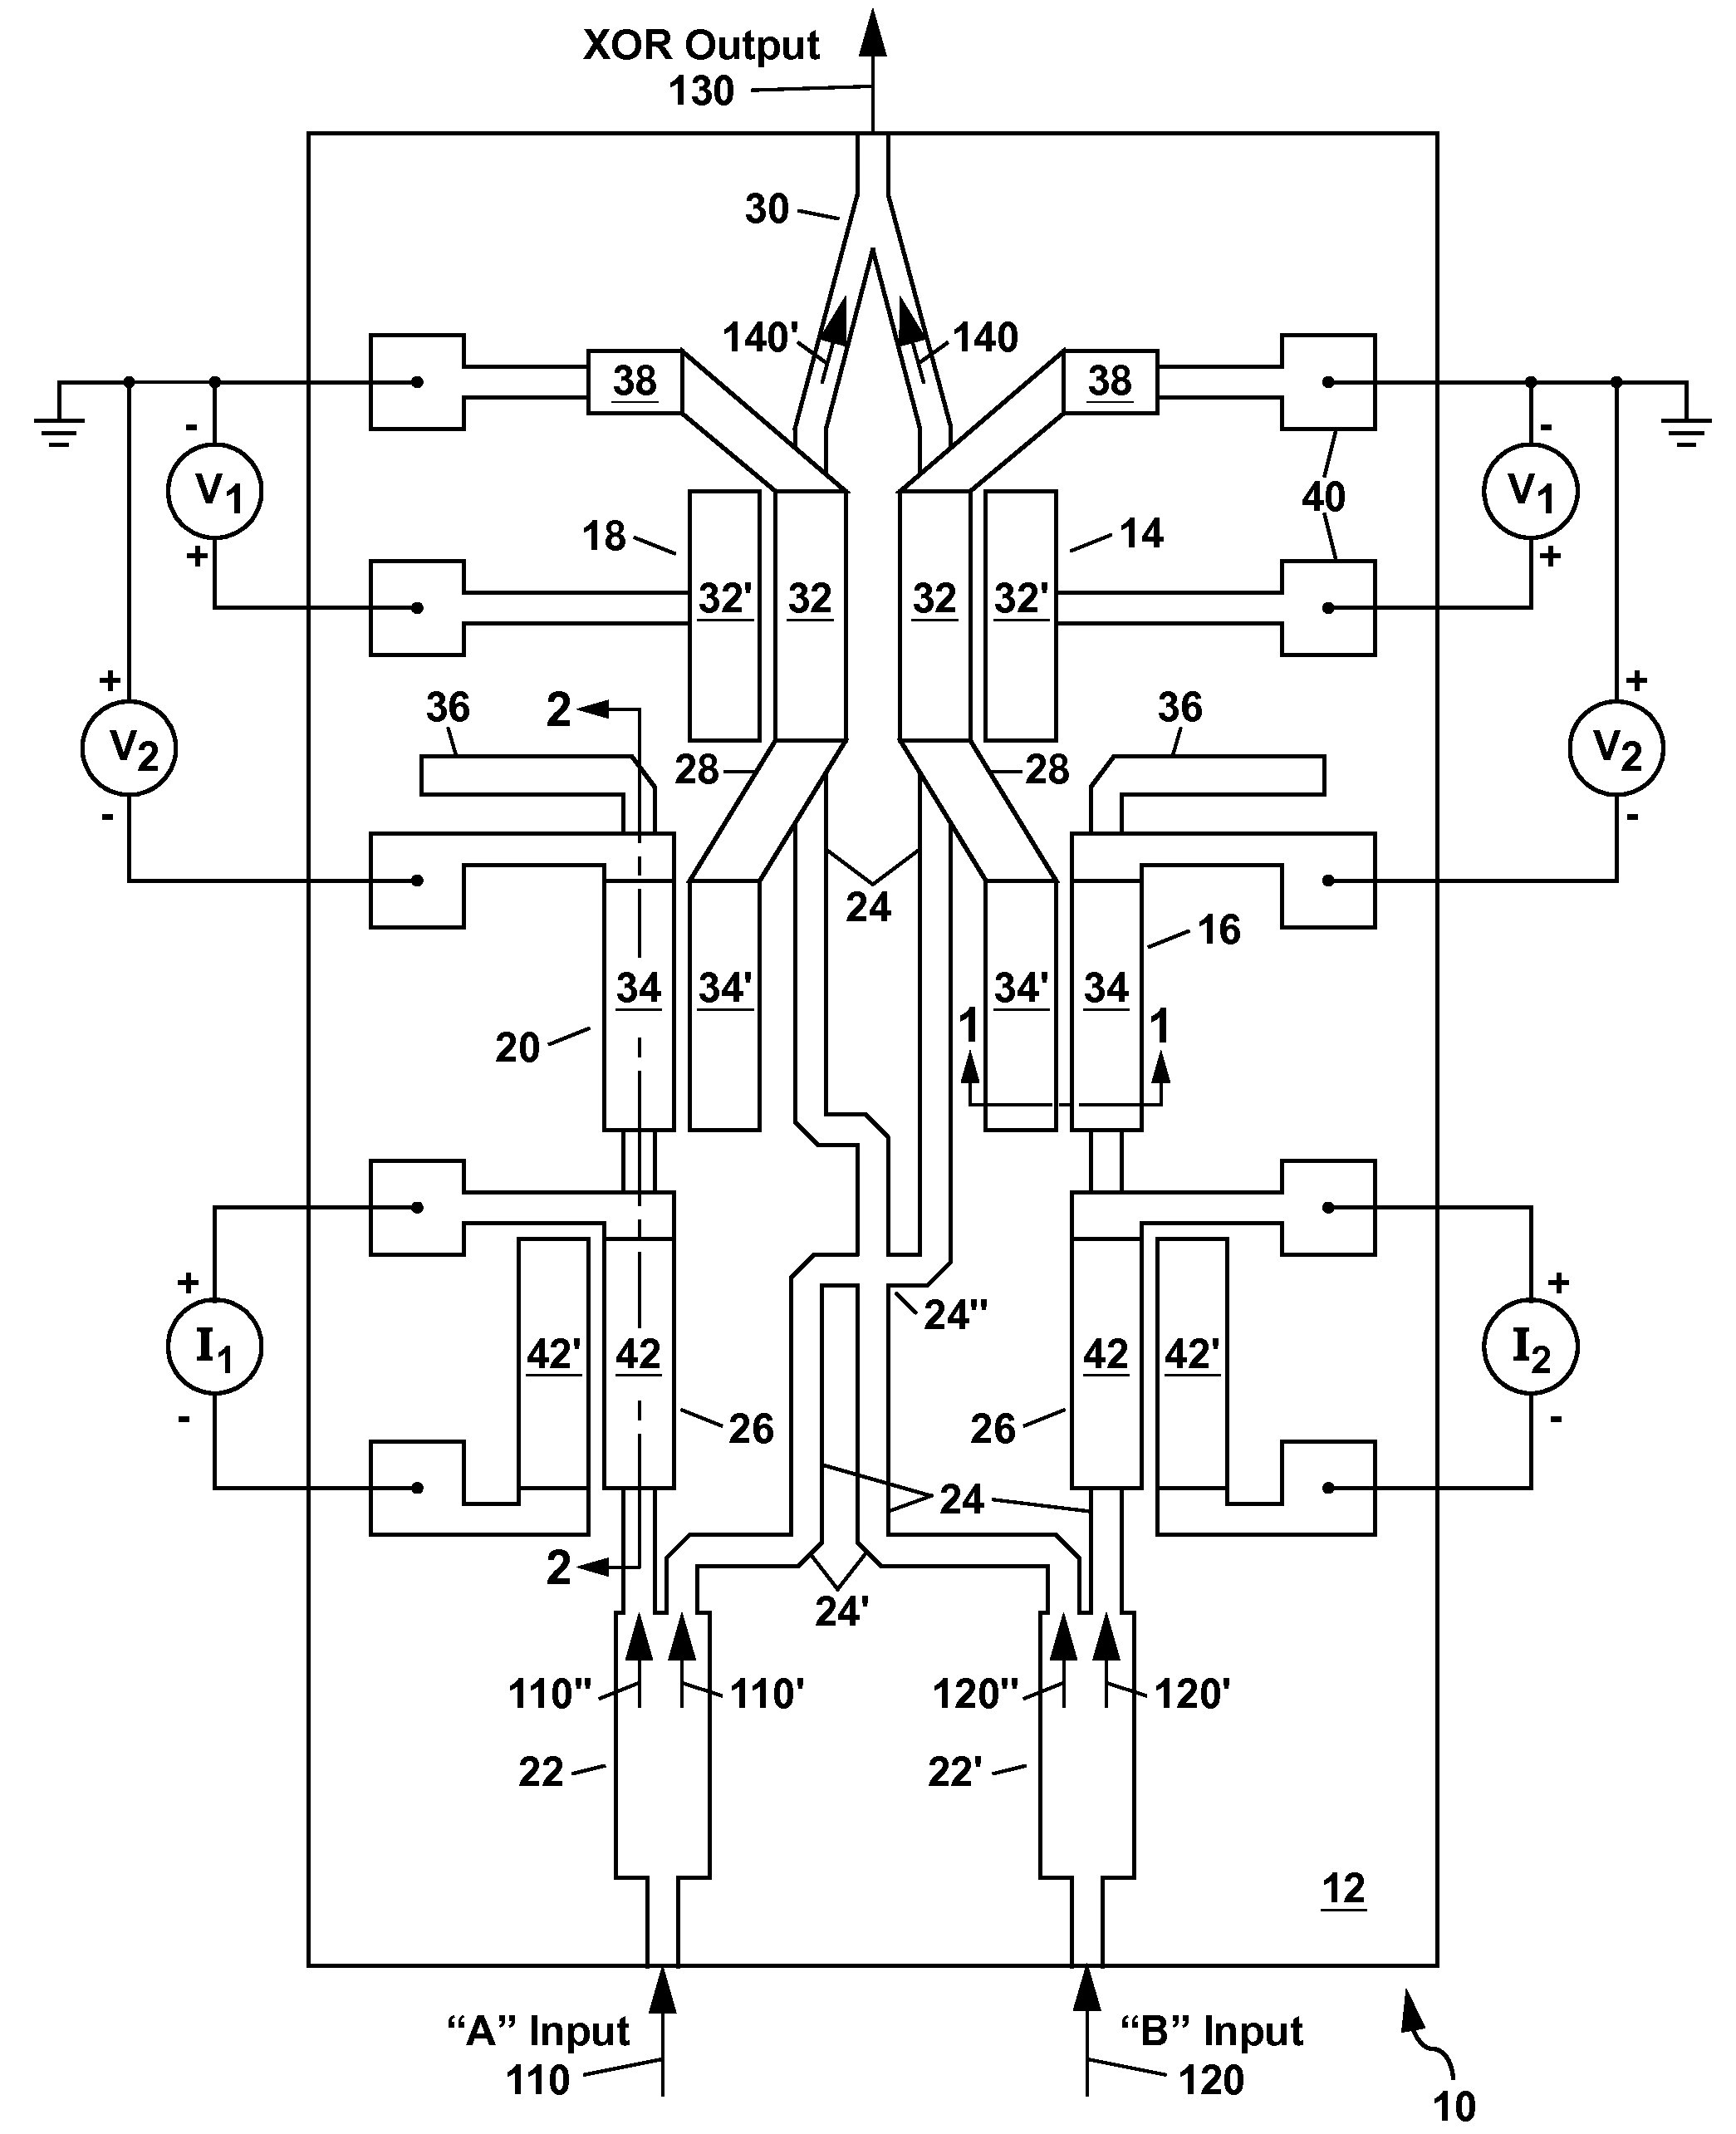 motor diagram viddyup com data contributors dc circuitus08582931 20131112 d00000 png